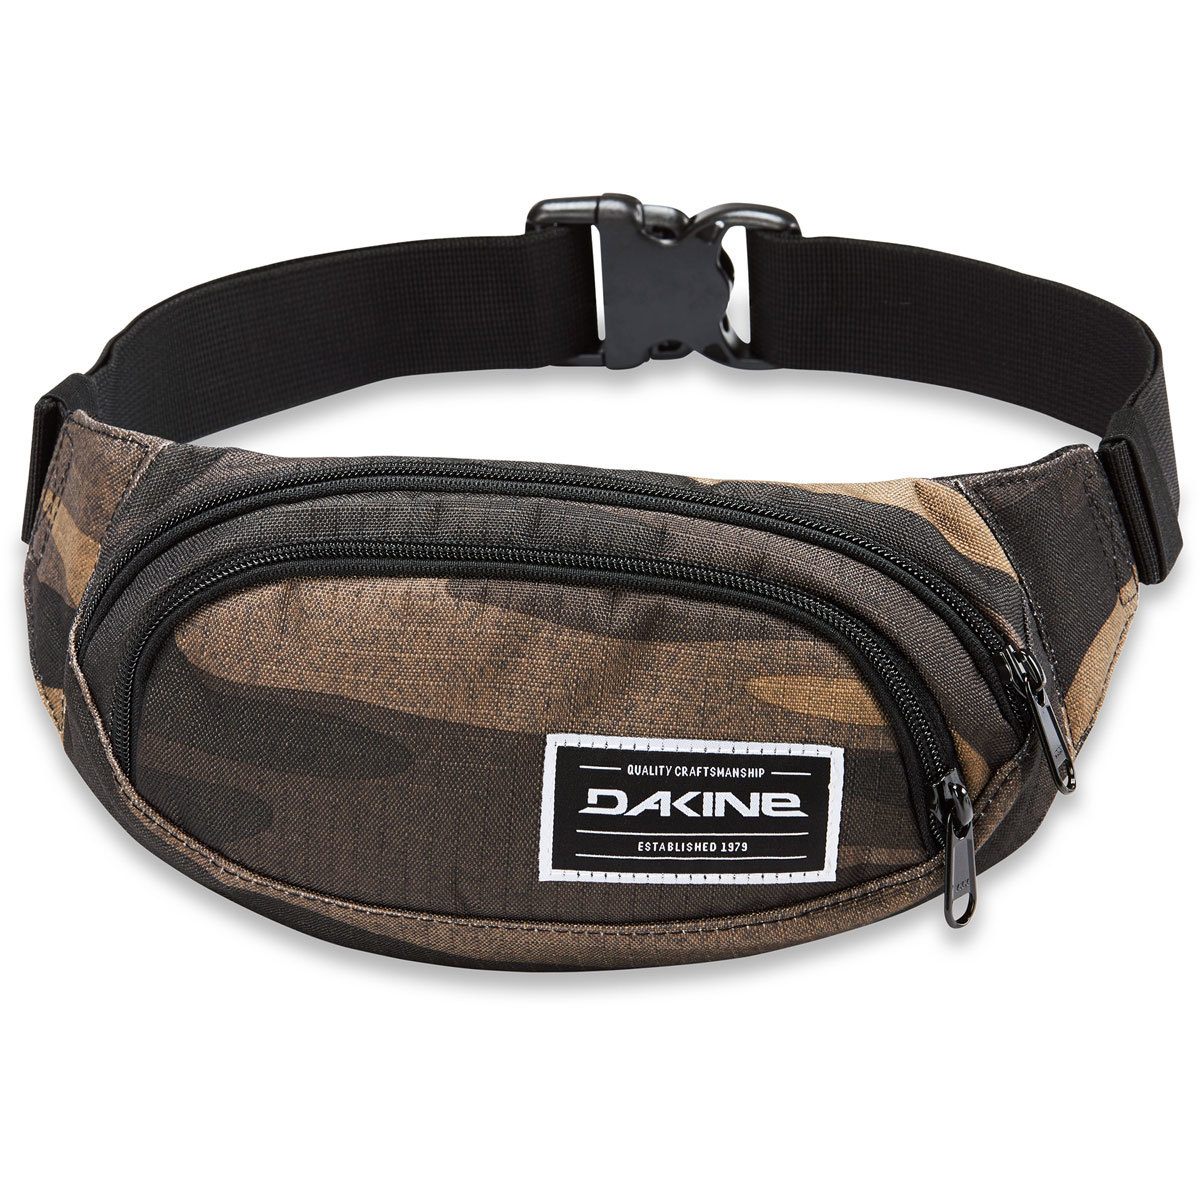 Поясные сумки Dakine Сумка поясная Dakine HIP PACK Field Camo HIPPACK-FIELDCAMO-610934244960_08130200_FIELDCAMO-91M_MAIN.jpg